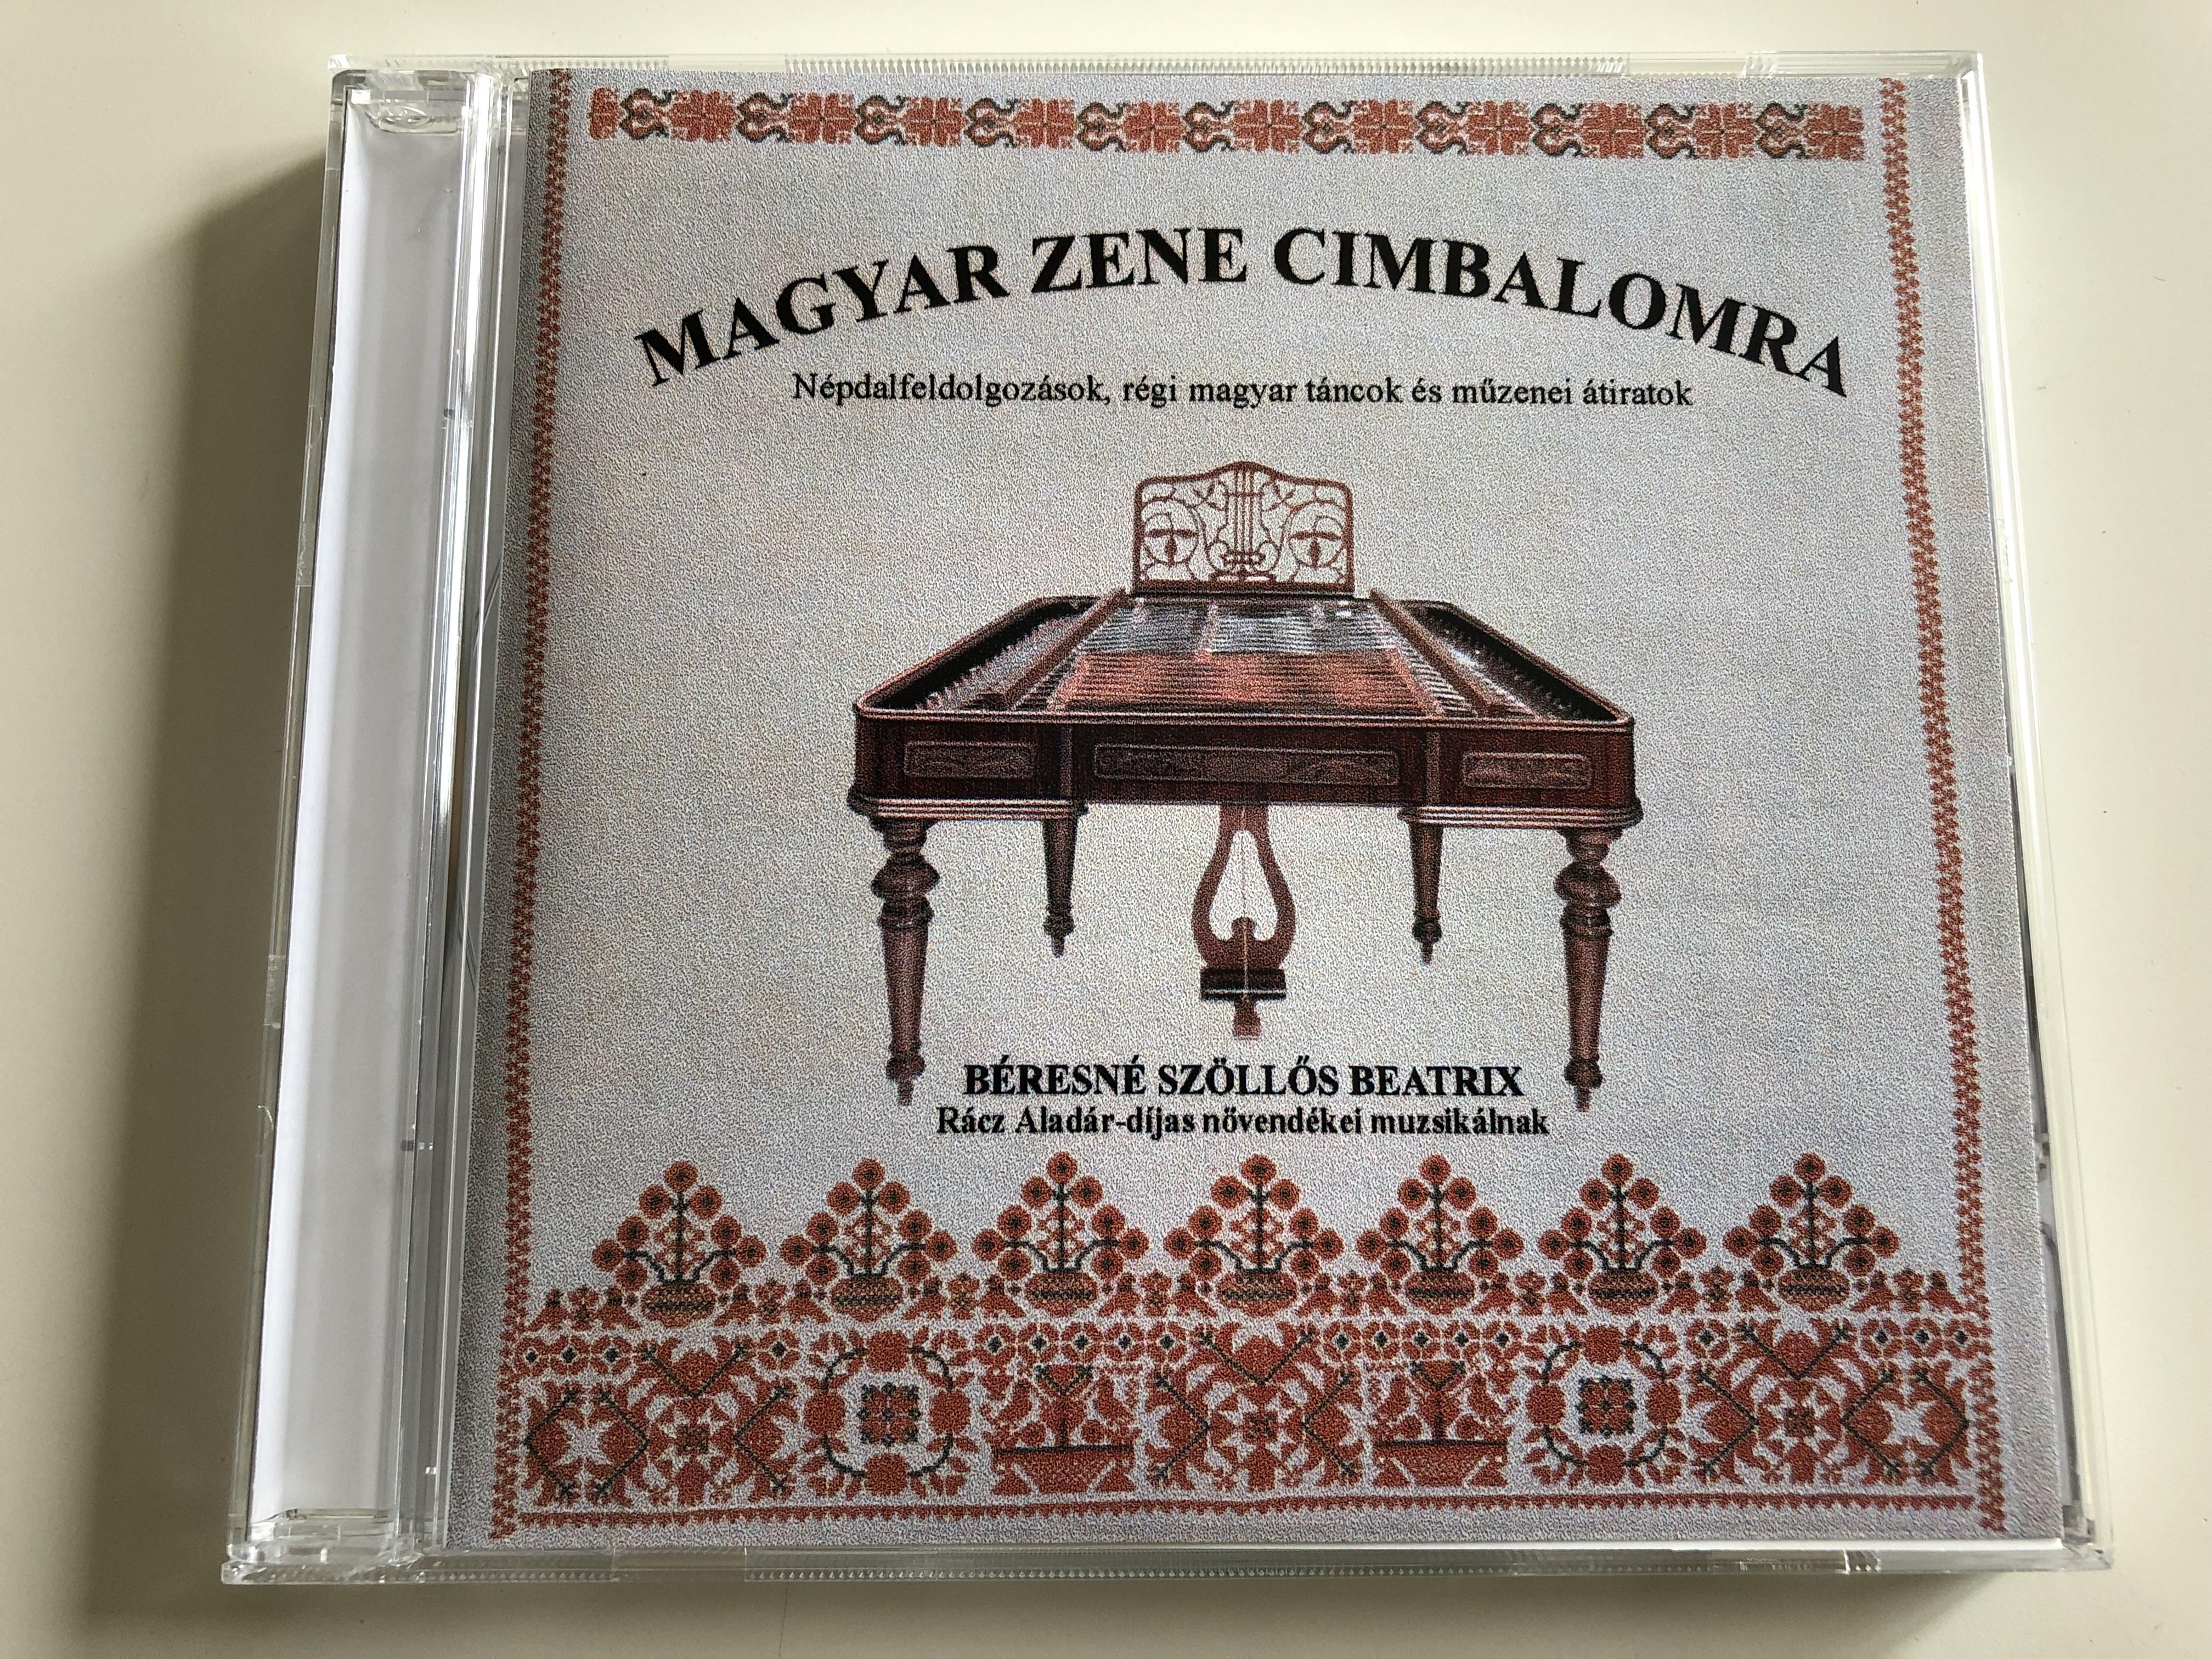 magyar-zene-cimbalomra-n-pdalfeldolgoz-sok-r-gi-magyar-t-ncok-s-m-zenei-tiratok-b-resn-sz-ll-beatrix-r-cz-alad-r-d-jas-n-vend-kei-muzsik-lnak-audio-cd-2004-1-.jpg